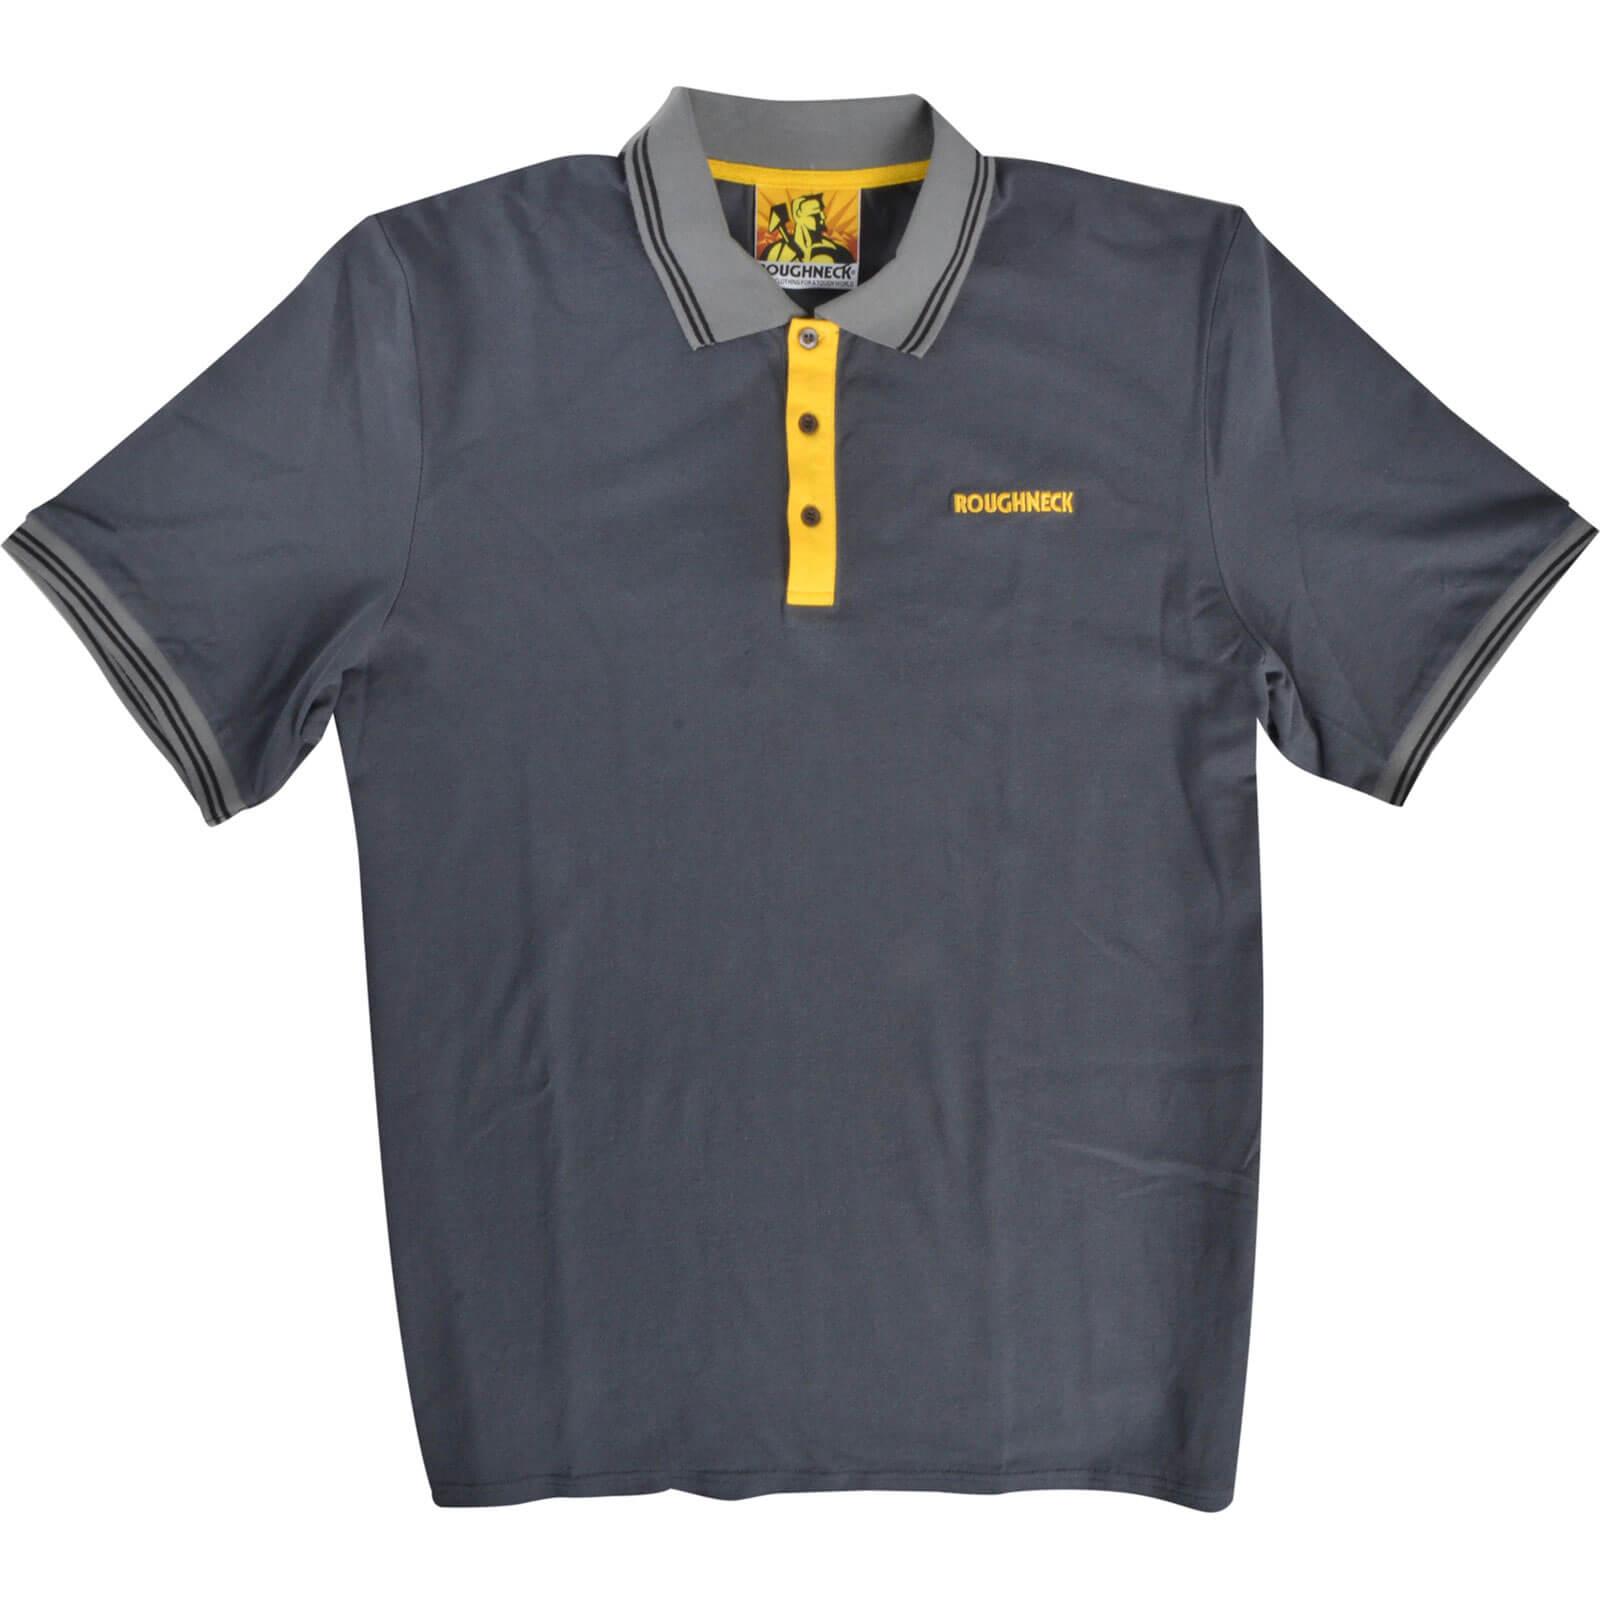 Roughneck Mens Polo Shirt Grey M